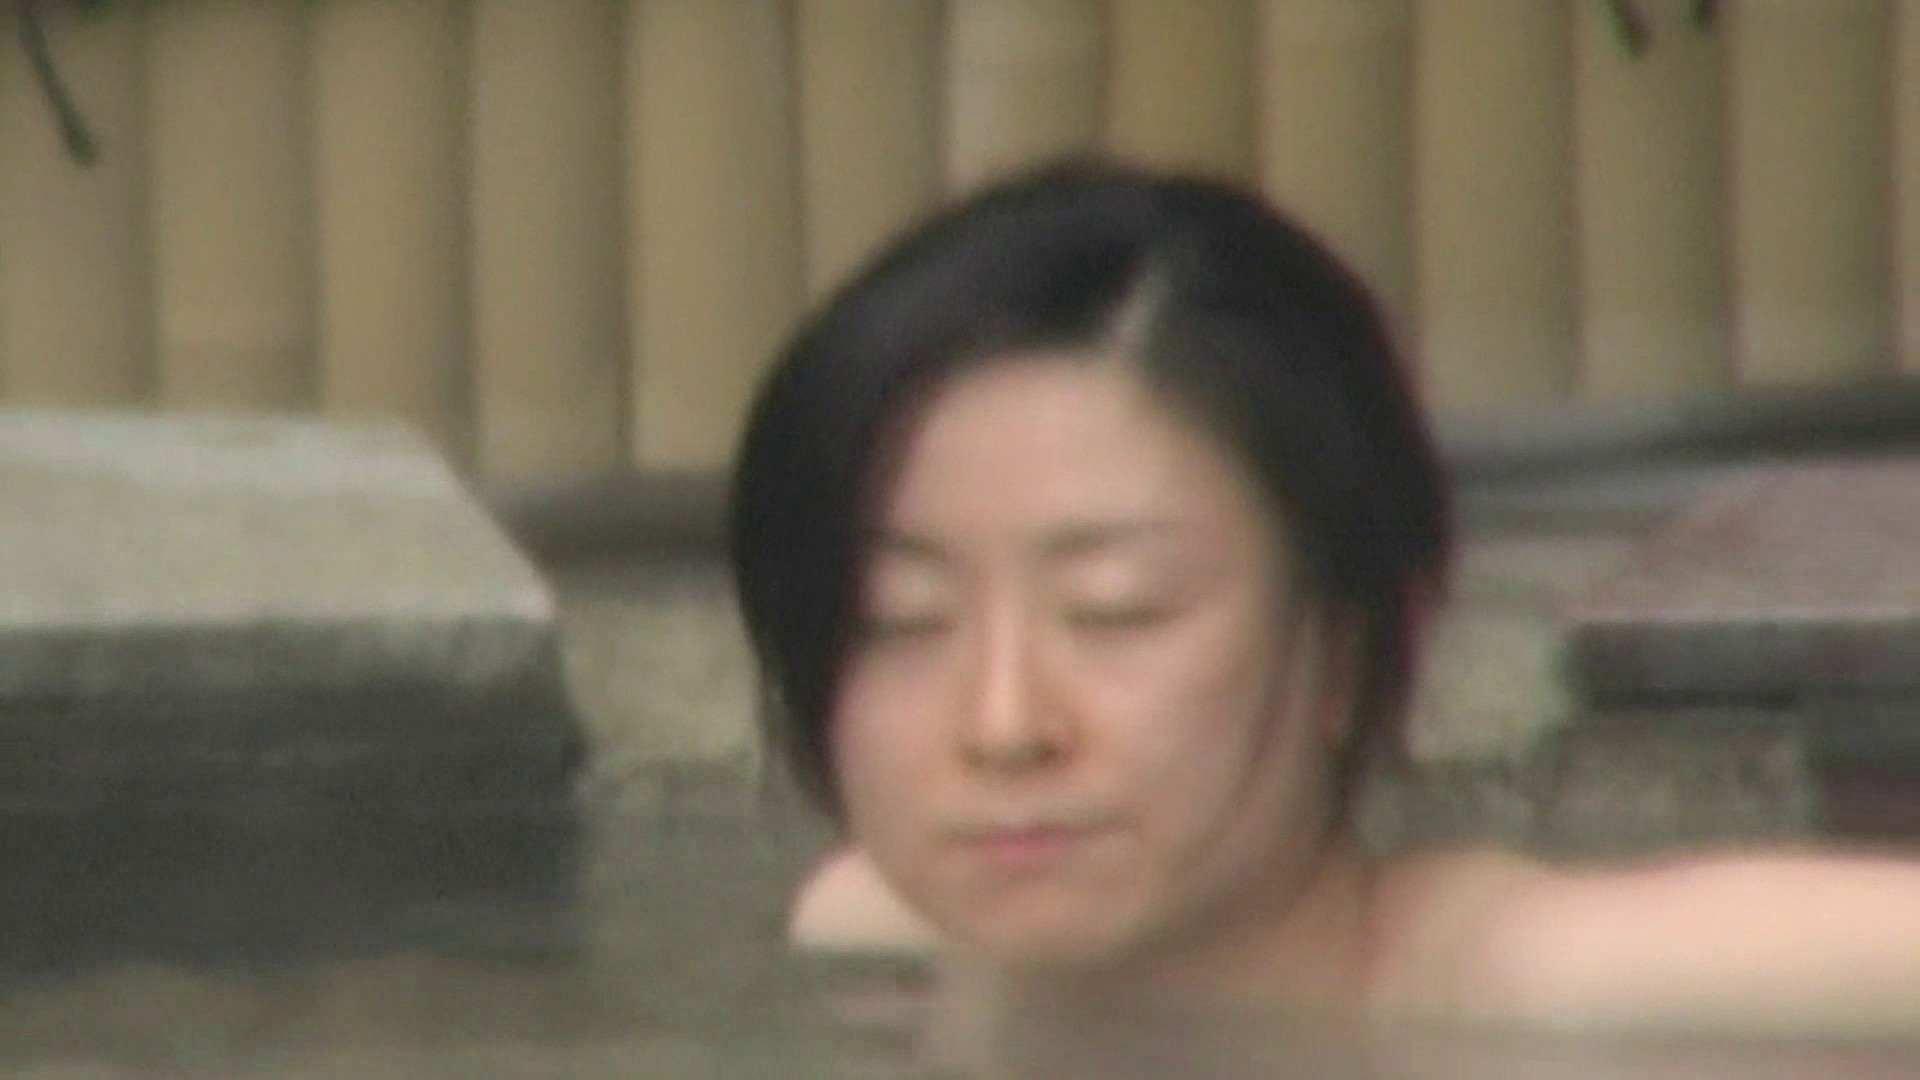 Aquaな露天風呂Vol.548 OLセックス のぞきエロ無料画像 103画像 23